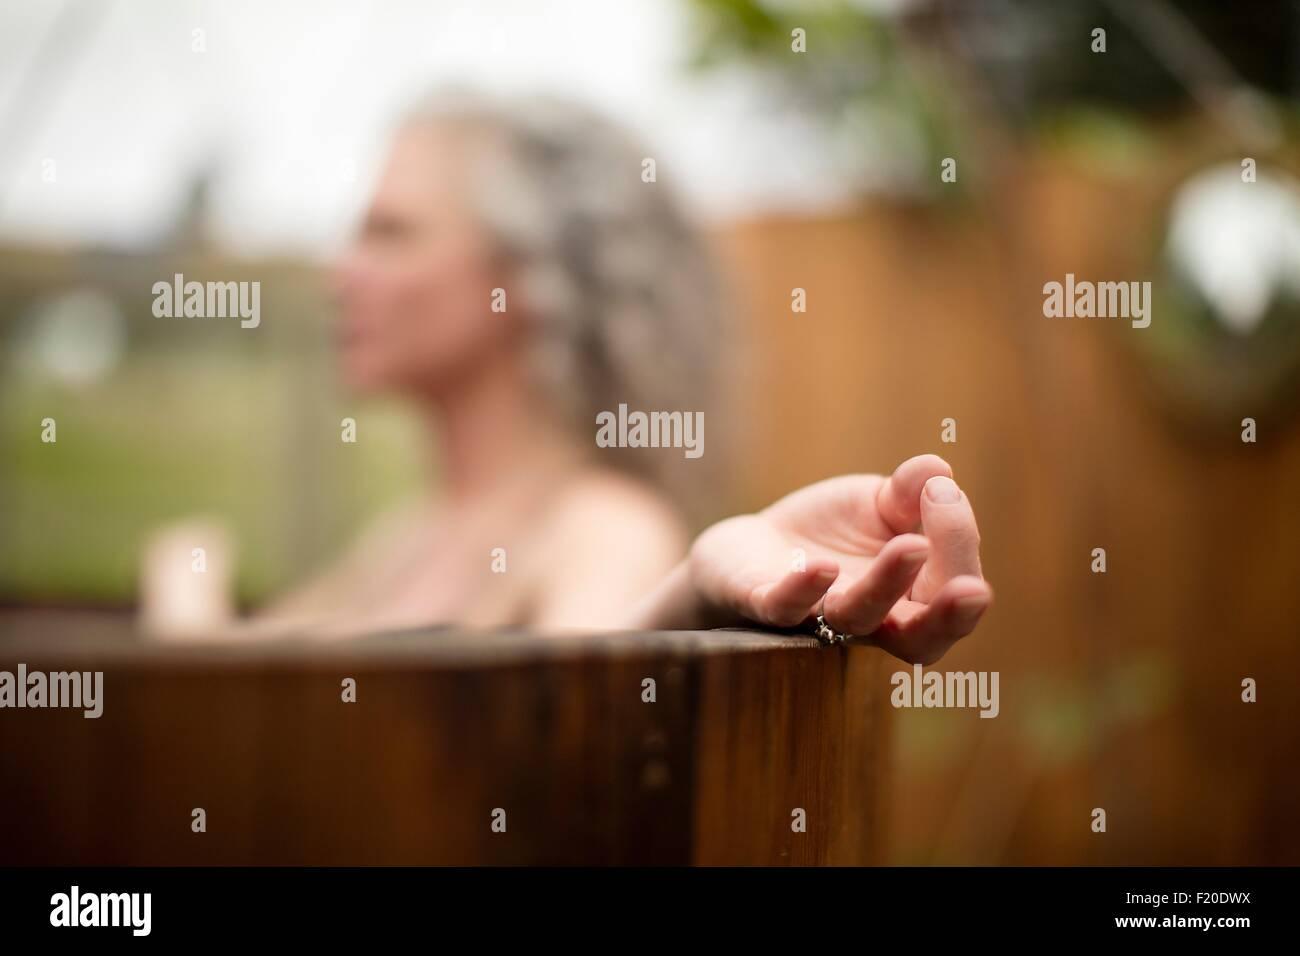 Mature woman meditating in hot tub at eco retreat - Stock Image